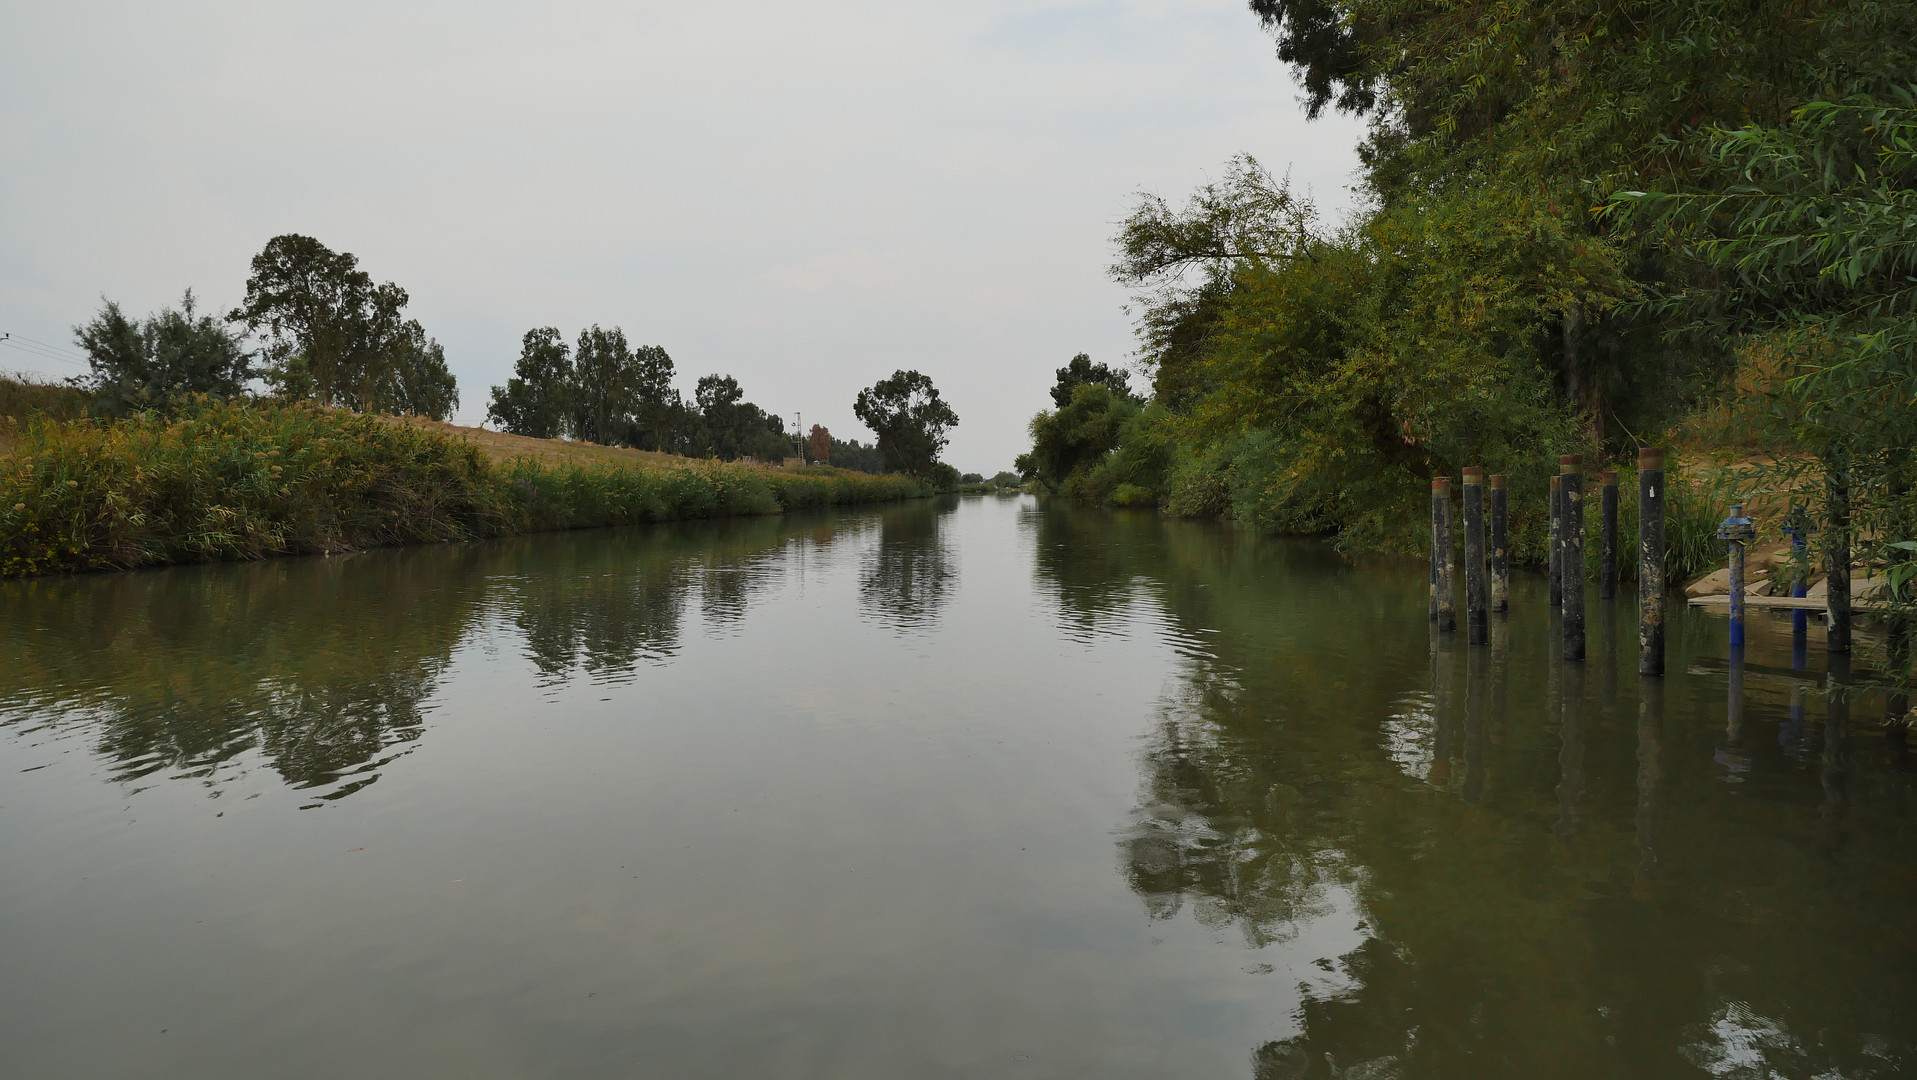 Jordan River by Viewing Area 5